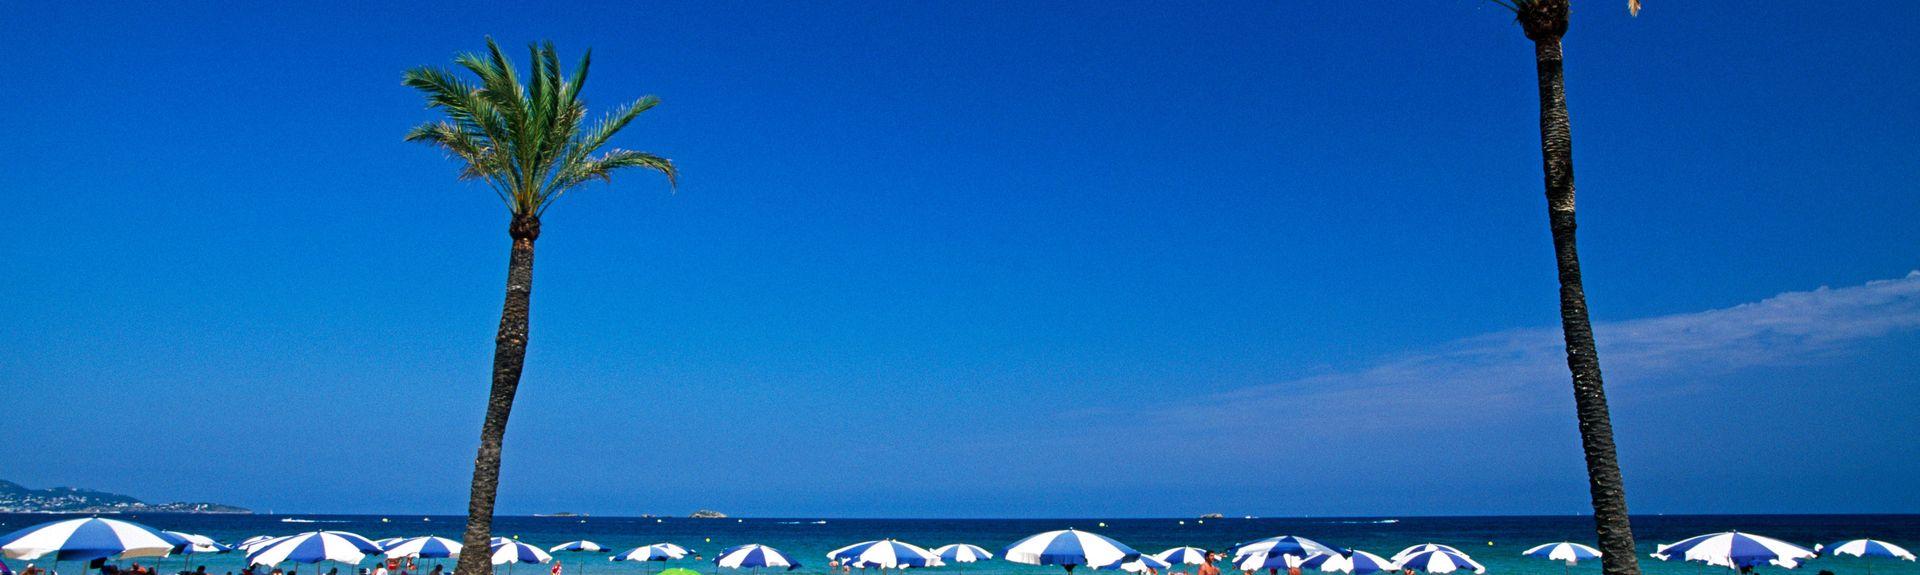 Platja d'en Bossa, Ibiza, Spain